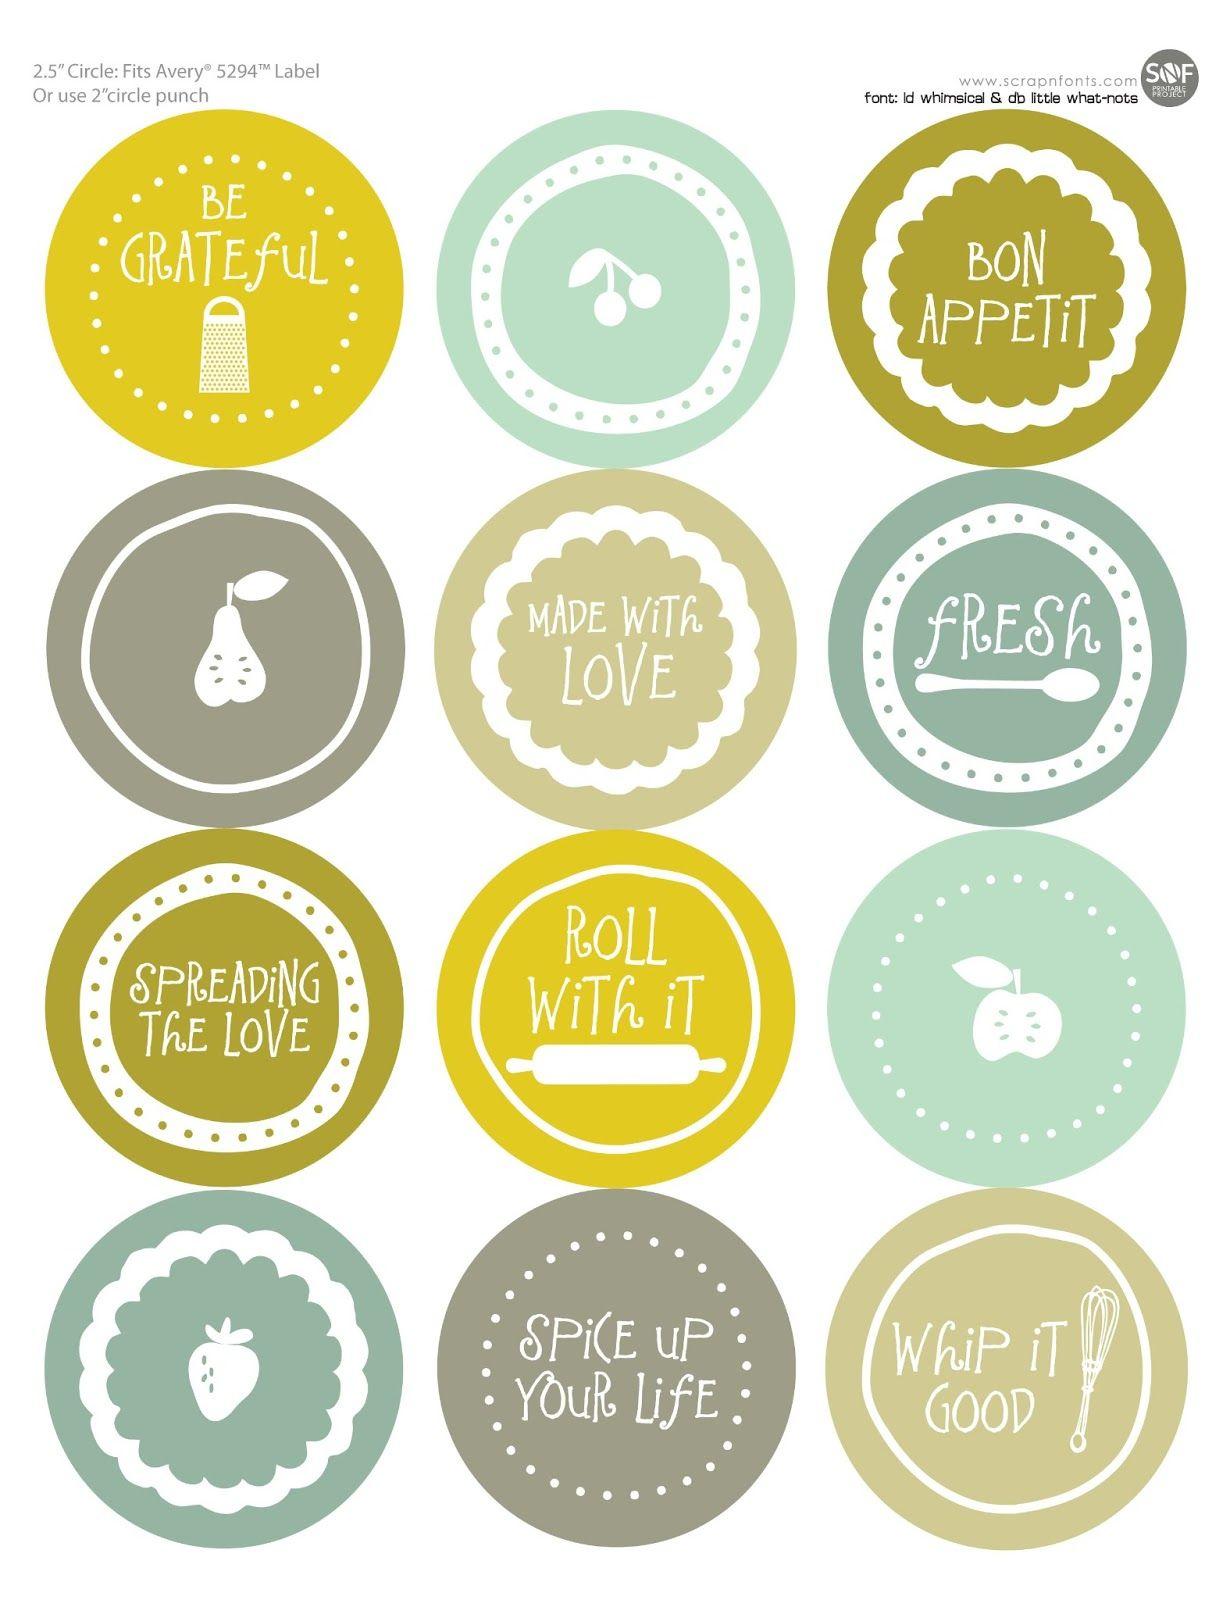 Fontaholic: Freebie Friday: Mason Jar Tops | Jars & Labels & Design - Free Printable Jar Label Templates